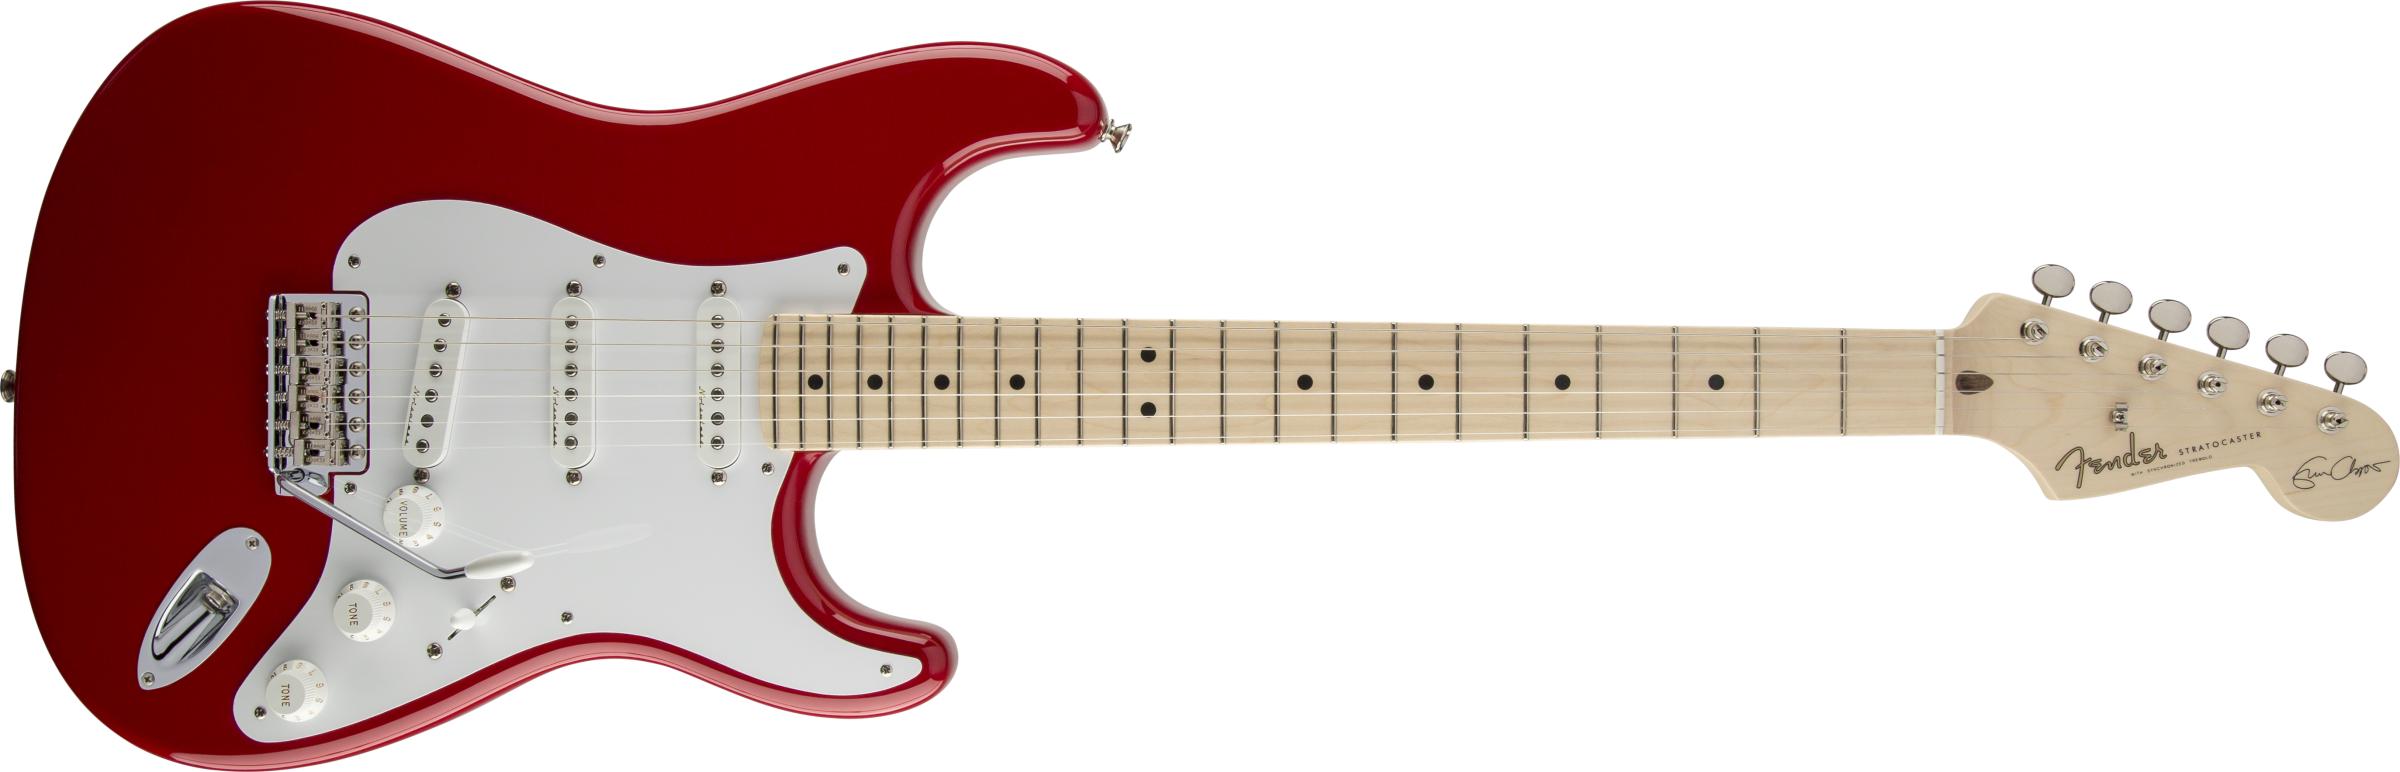 FENDER-Eric-Clapton-Stratocaster-Maple-Fingerboard-Torino-Red-sku-571000267